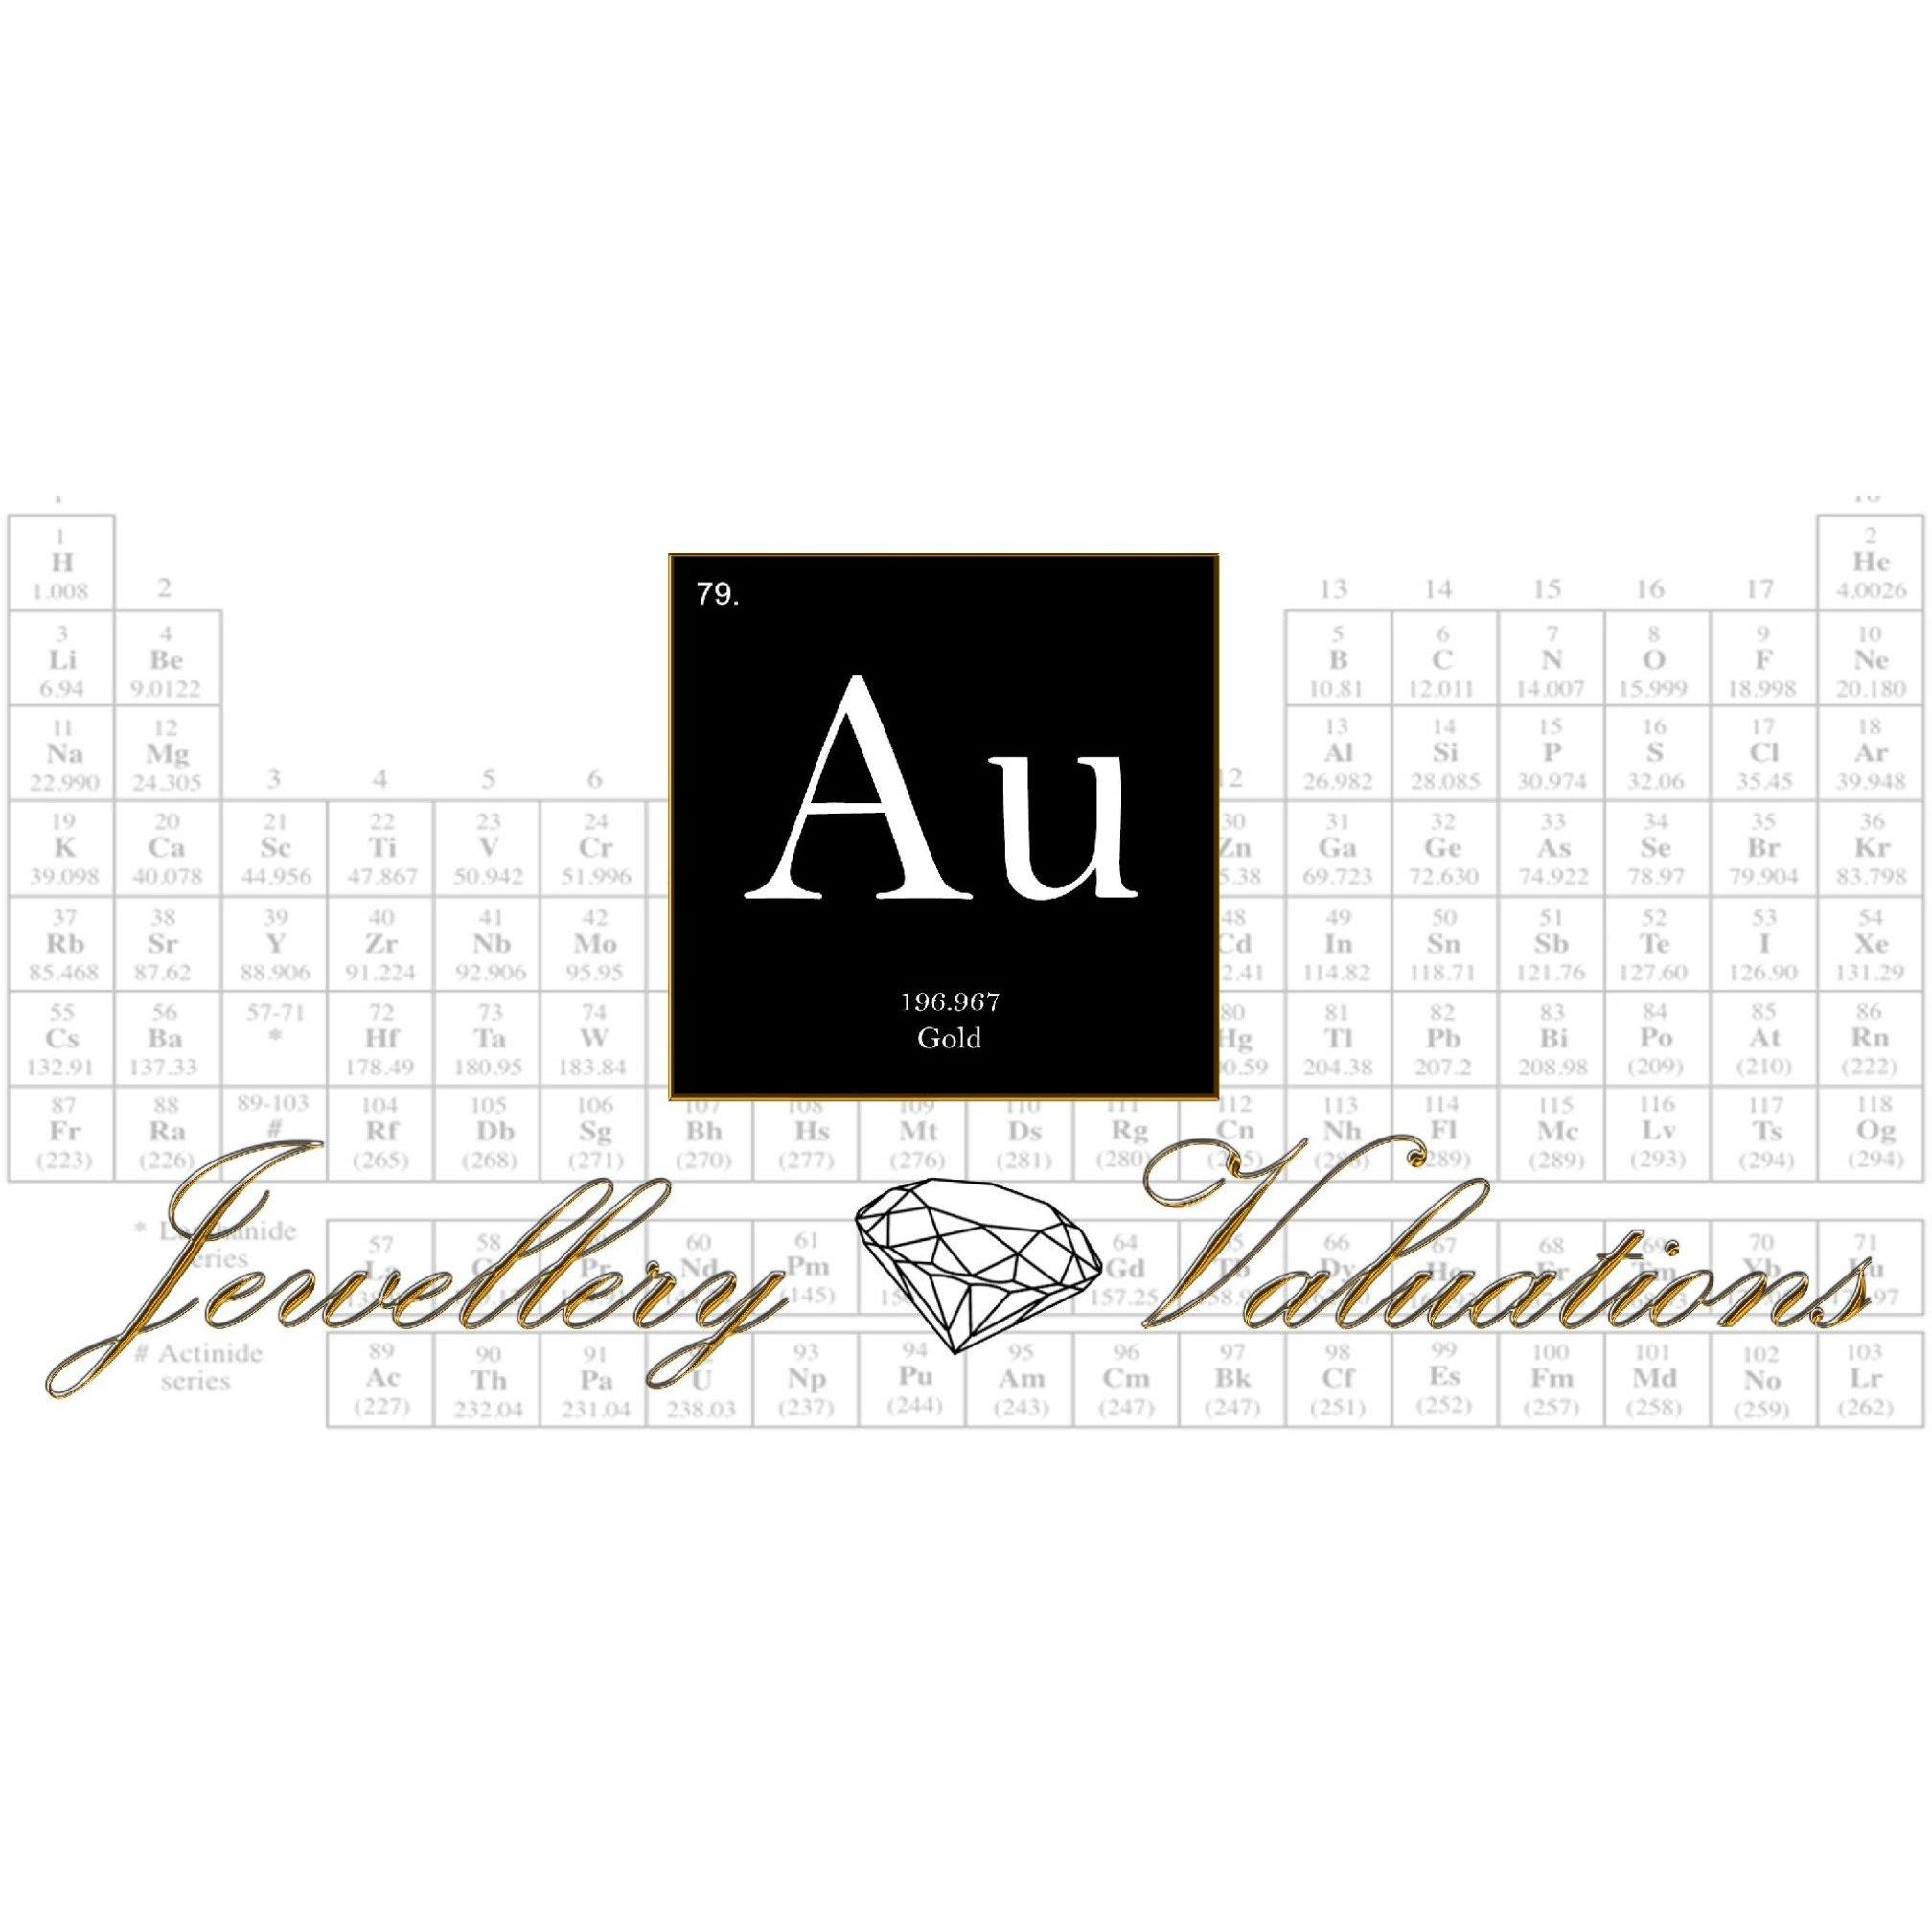 Au Jewellery Valuations - Farnham, Surrey GU9 7EB - 07976 966937 | ShowMeLocal.com